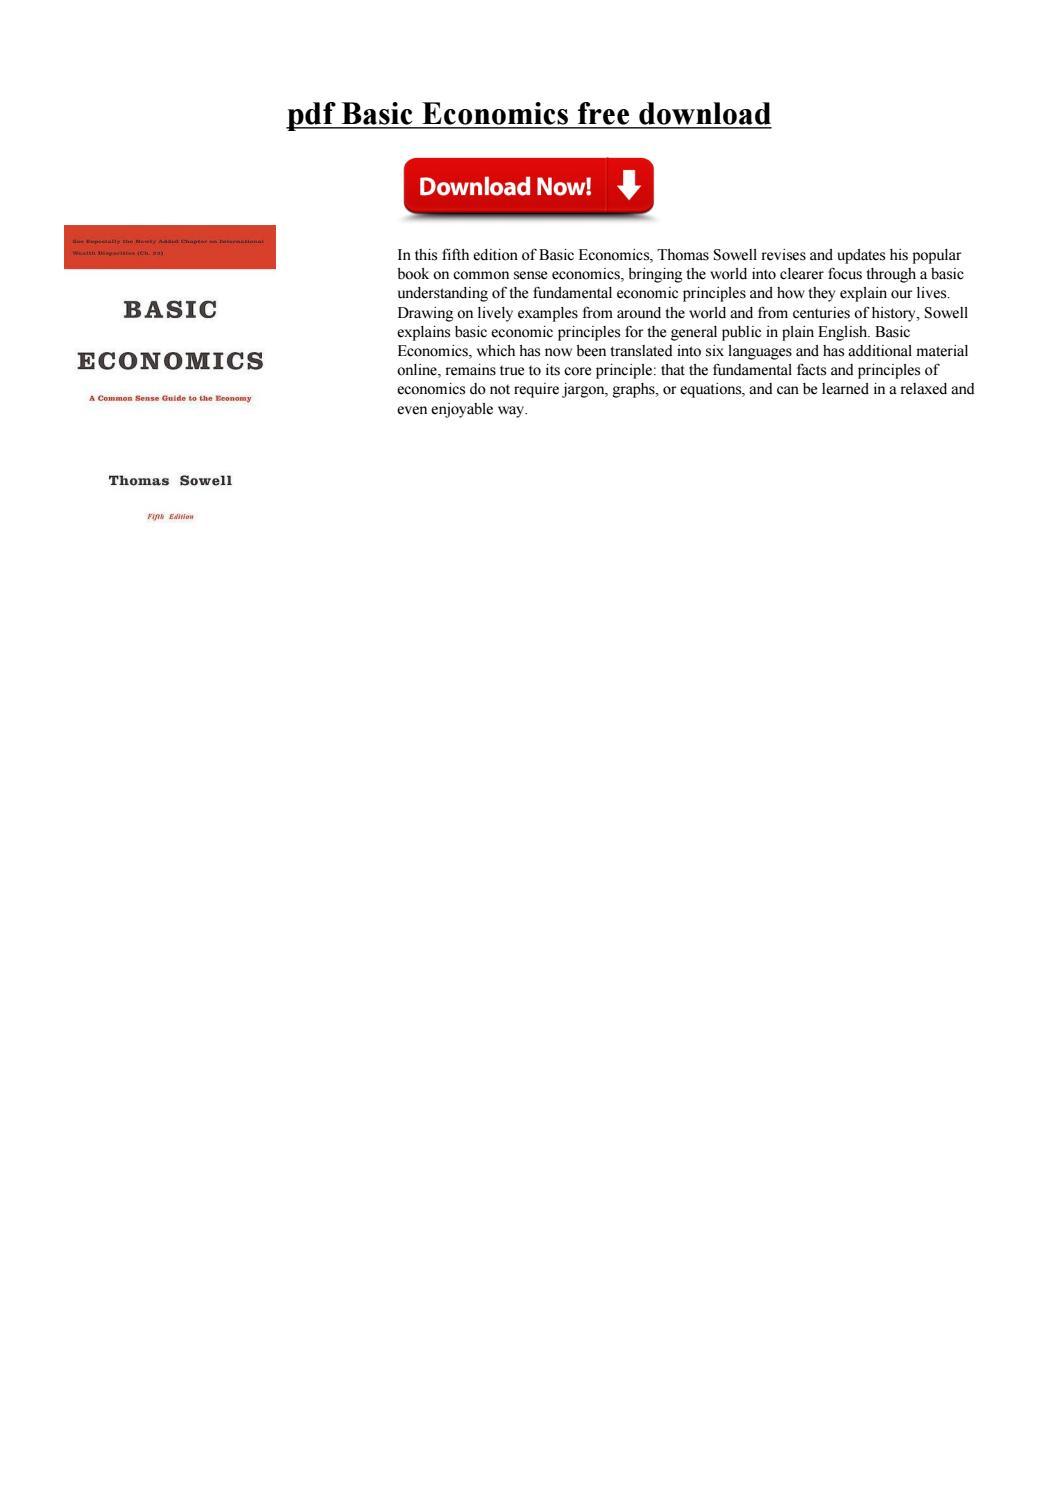 Basic Economics Thomas Sowell Pdf Free Download